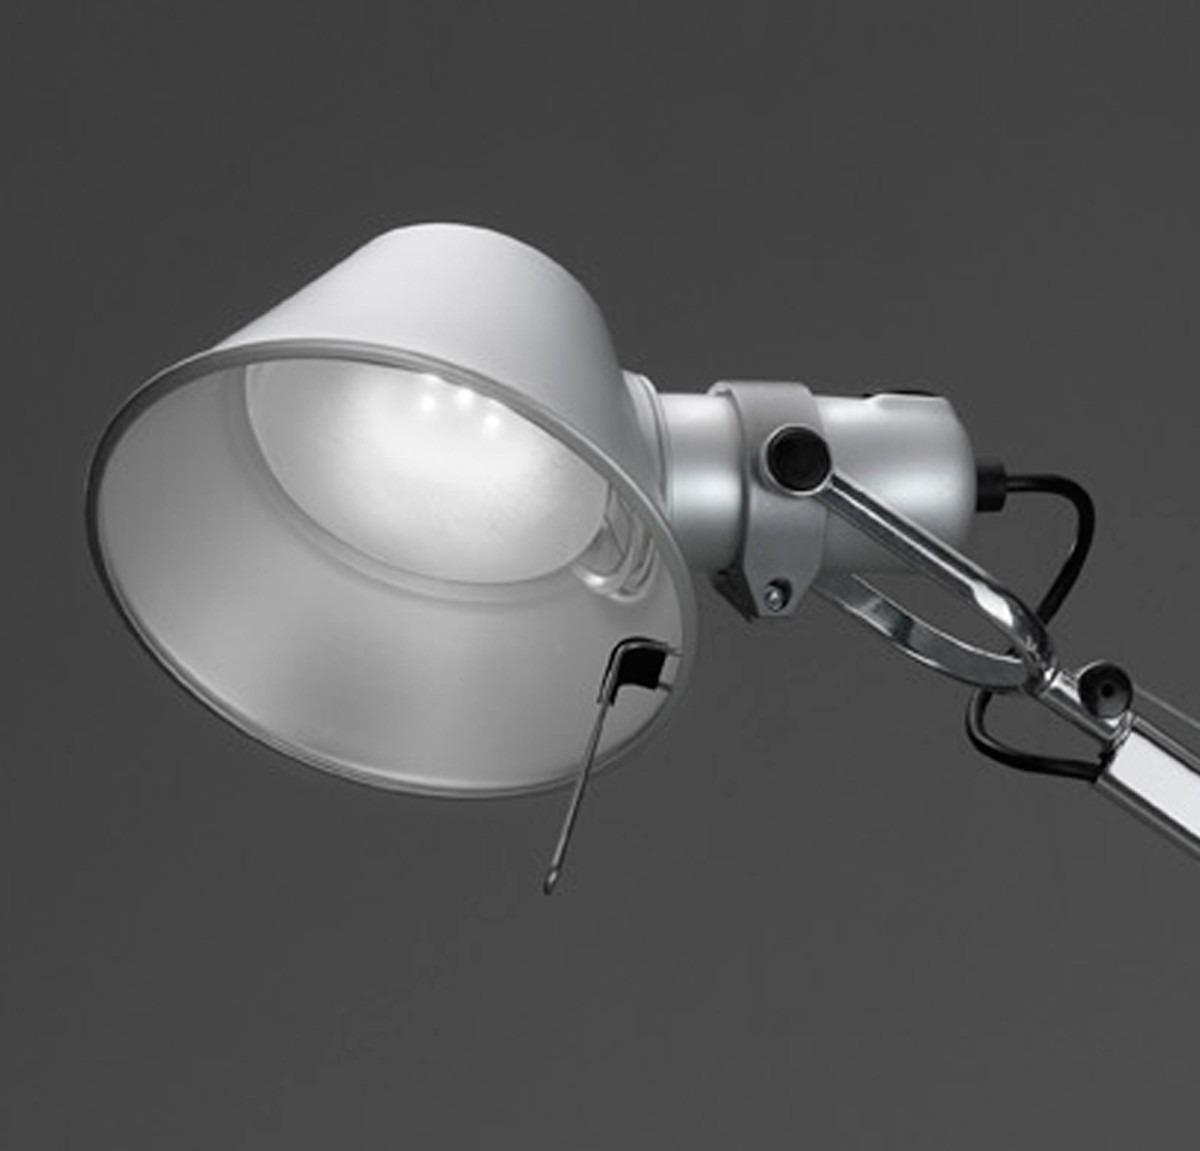 artemide tolomeo micro led wersja led a011900 salon meblowy warszawa 9design. Black Bedroom Furniture Sets. Home Design Ideas